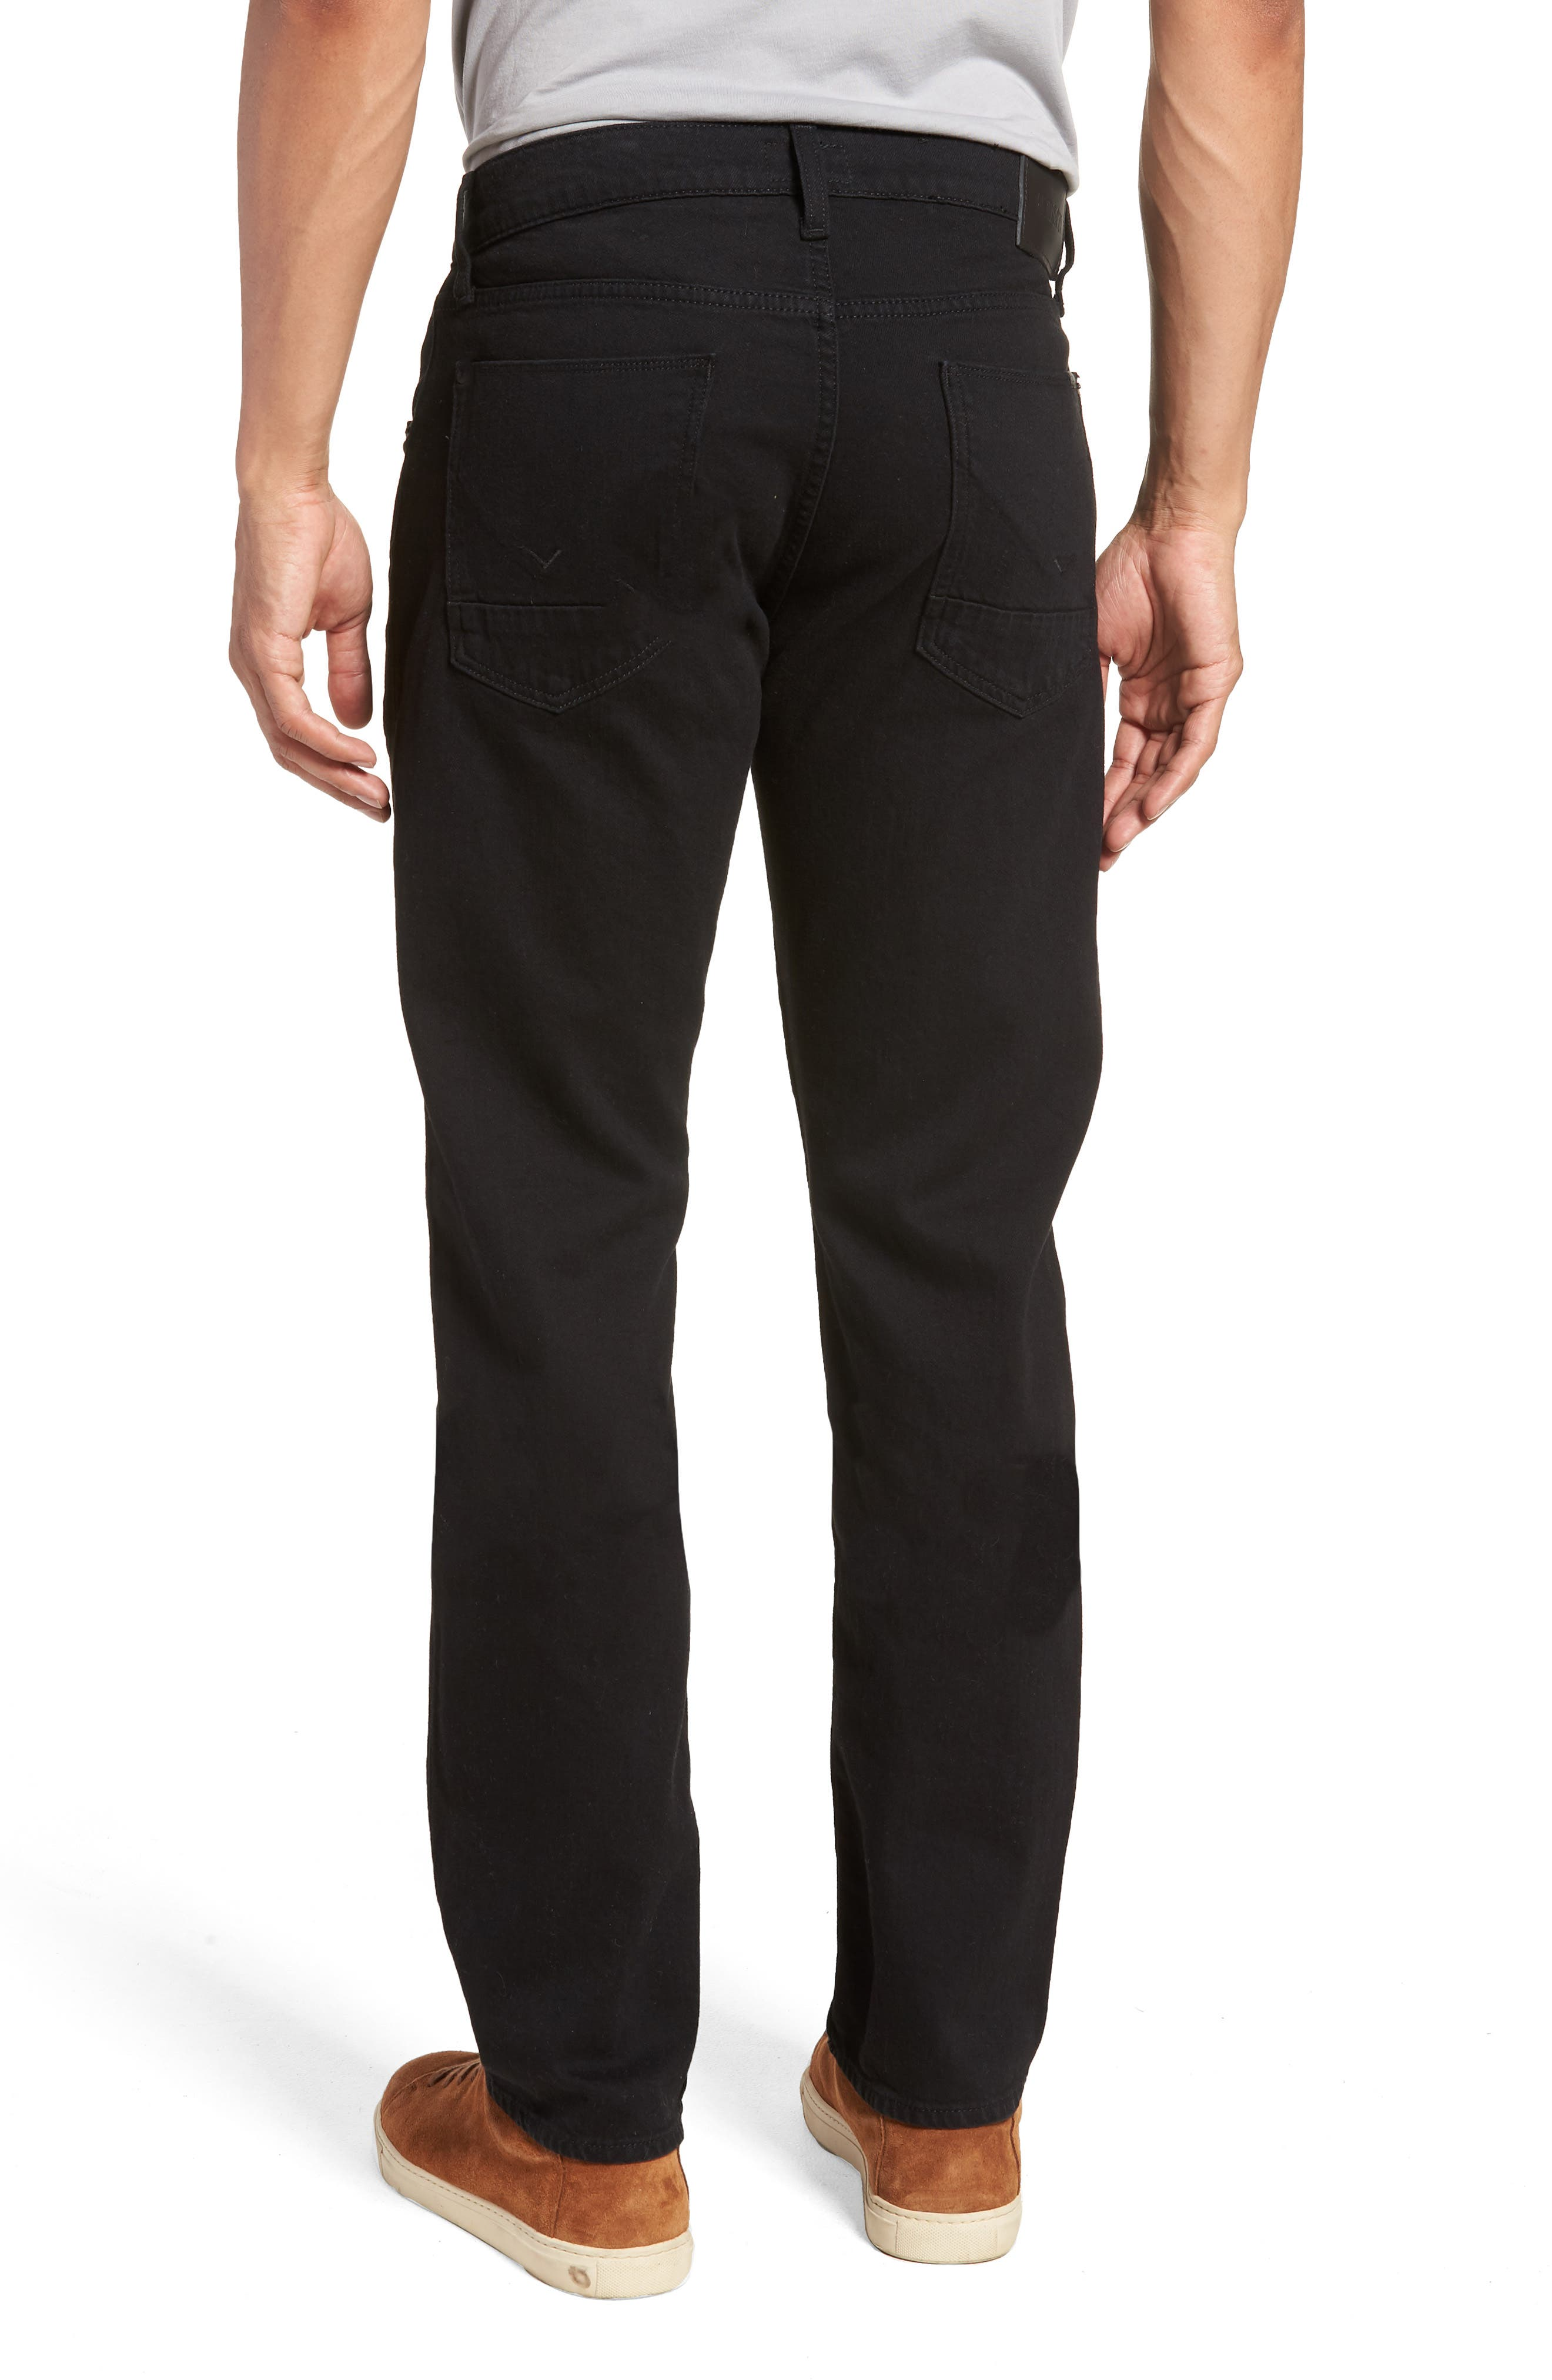 Blake Slim Fit Jeans,                             Alternate thumbnail 2, color,                             002